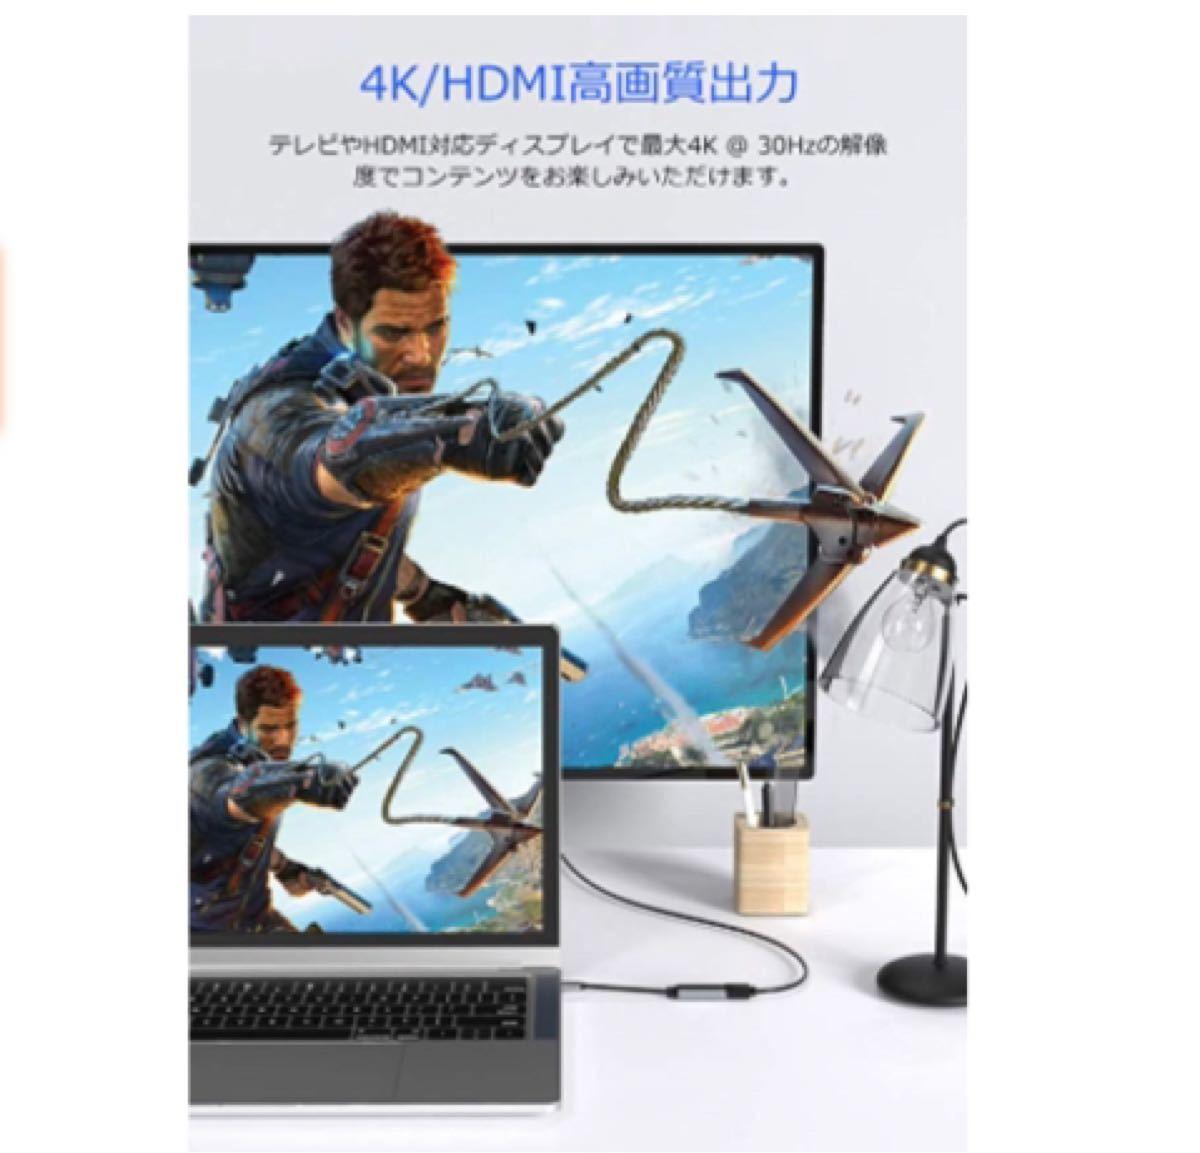 USB Type C to HDMI アダプター 4K変換 高解像度4K映像出力 超軽量 耐久性 コンパクト